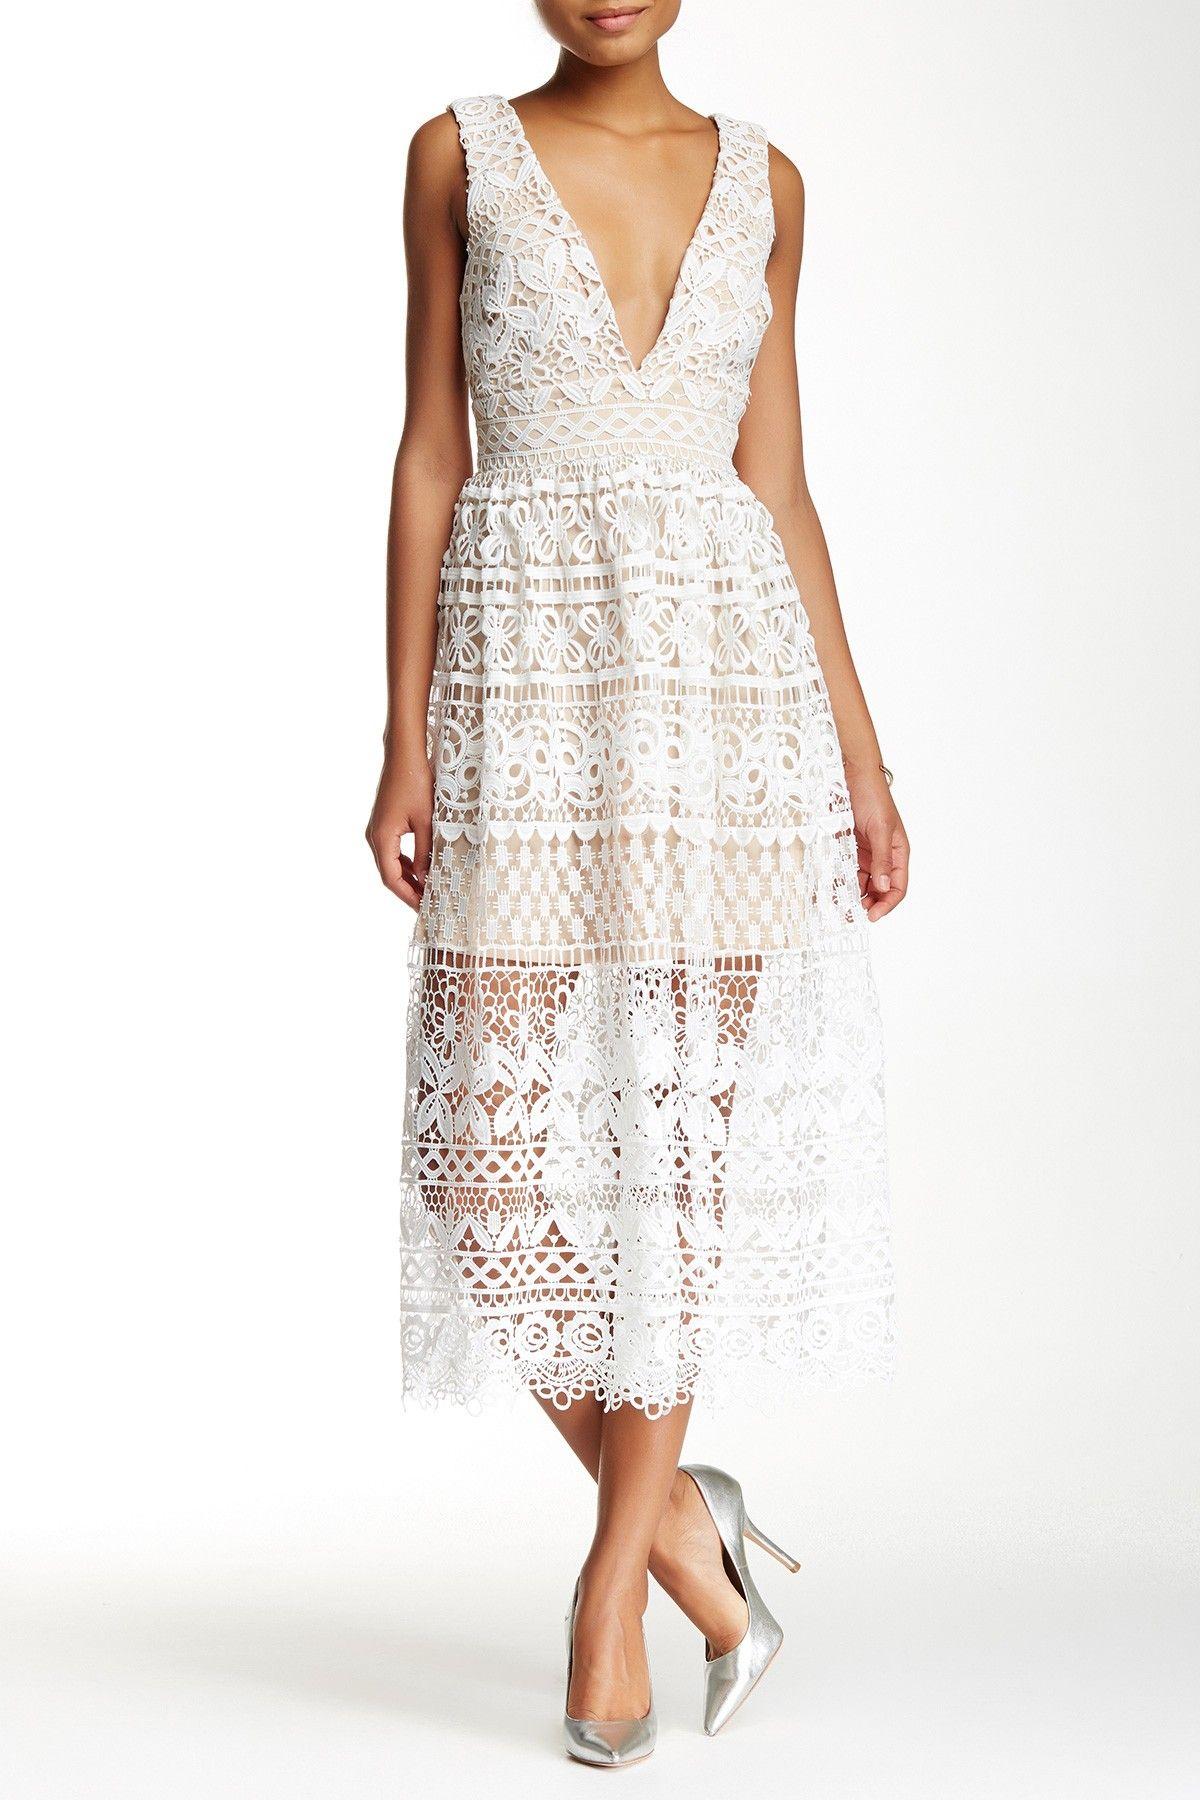 Lace Midi Dress Lace Midi Dress Dresses Nordstrom Dresses [ 1800 x 1200 Pixel ]